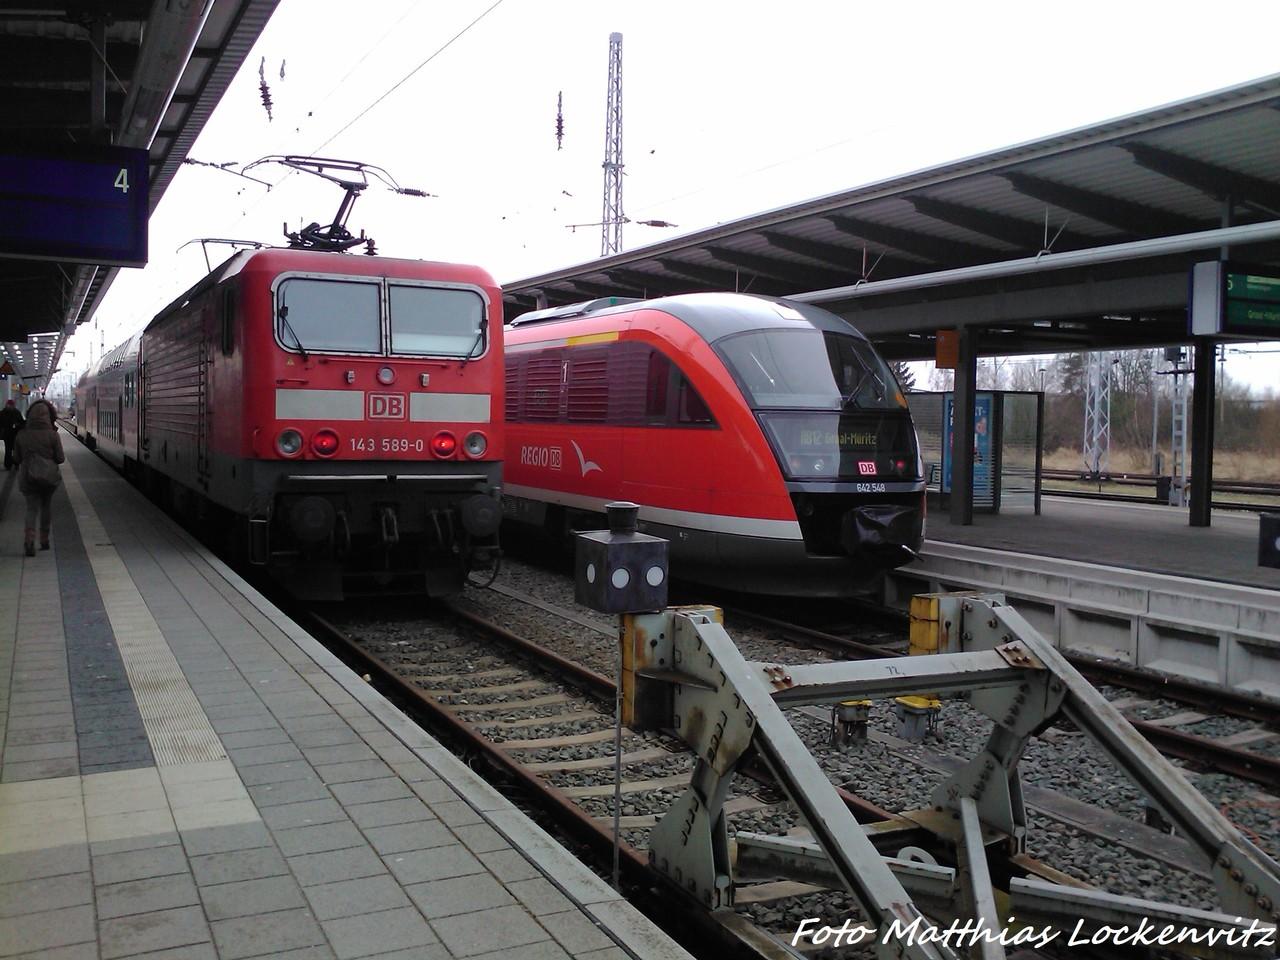 642 548 & 143 589-0 Im Bahnhof Rostock am 3.2.13